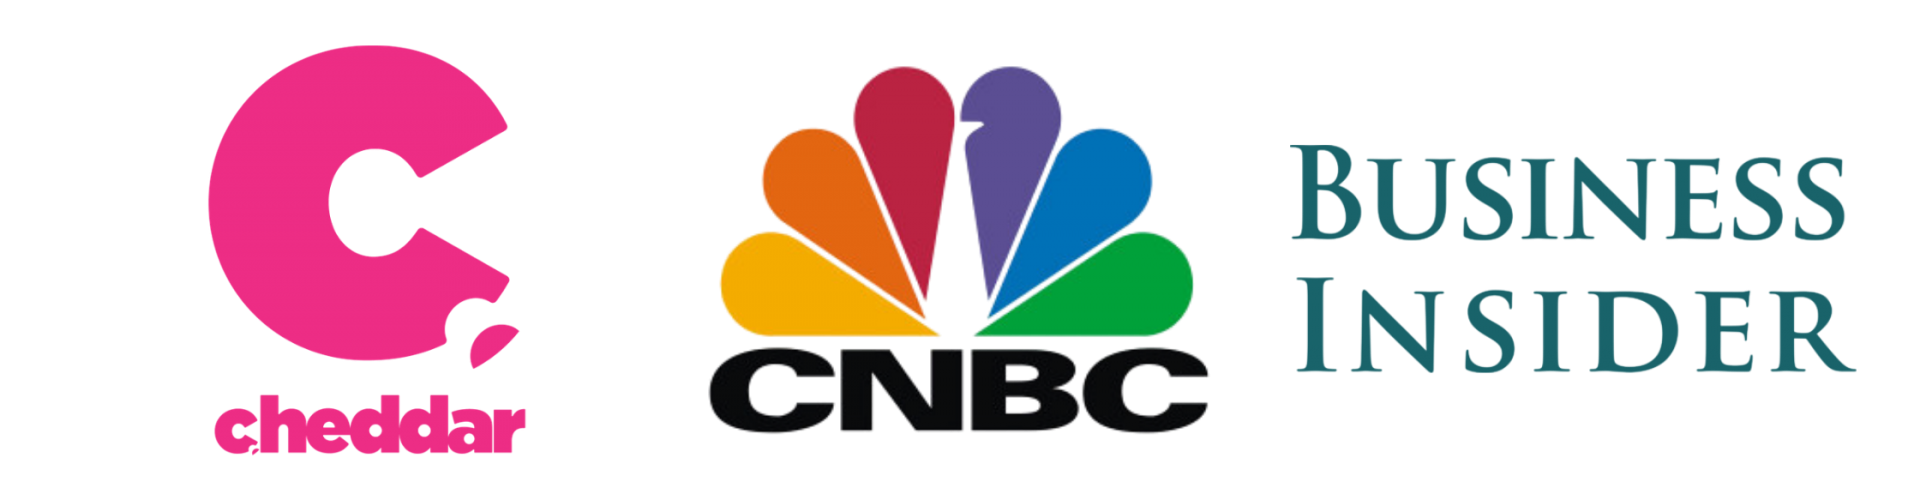 newstreet-advisors-group-press